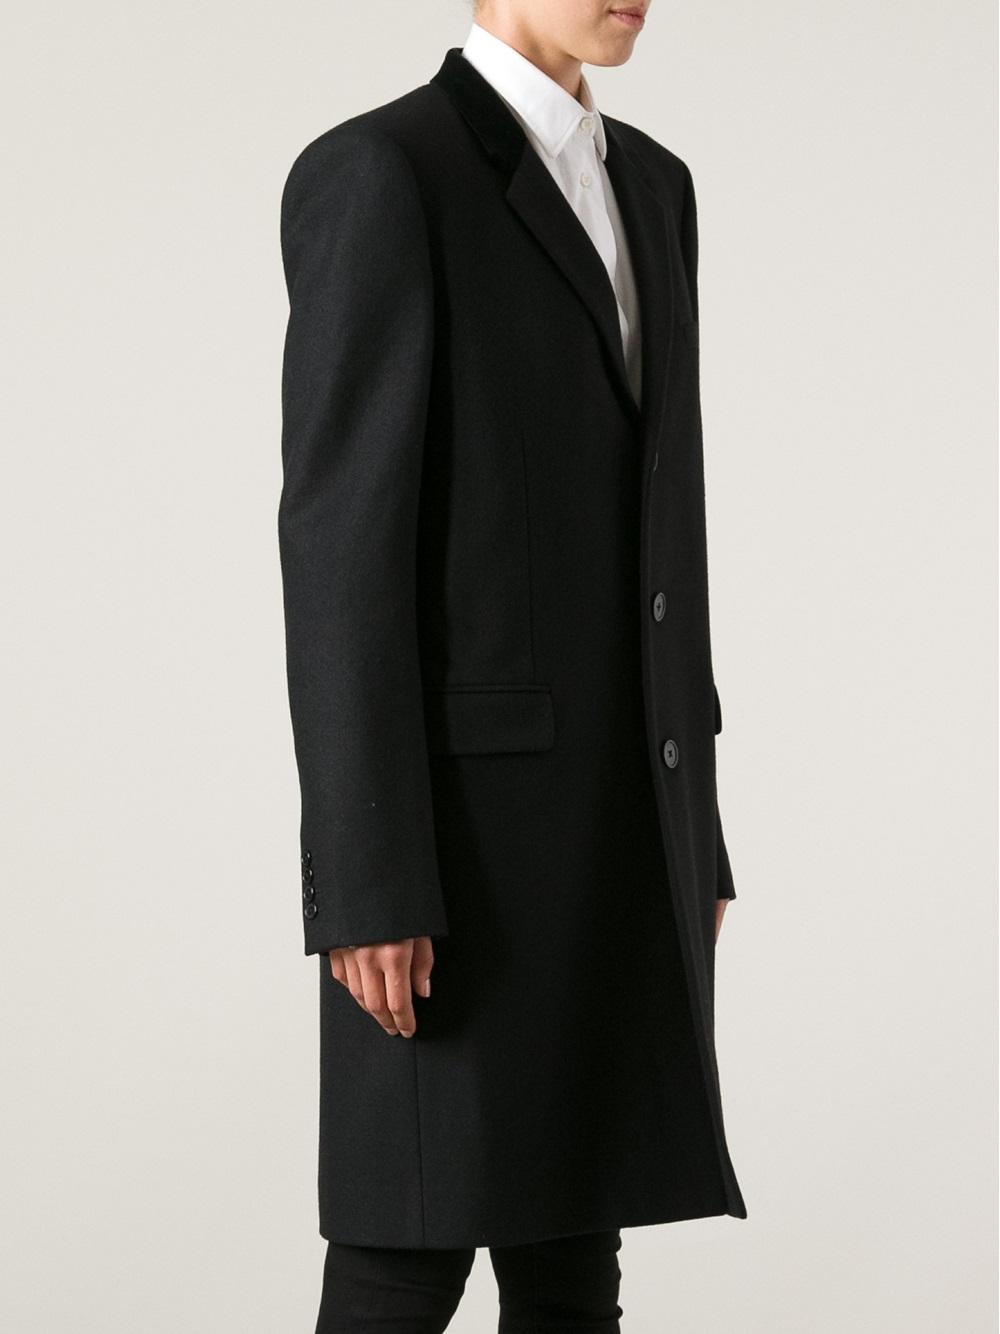 71678bda213 Saint Laurent Single Breasted Coat in Black for Men - Lyst